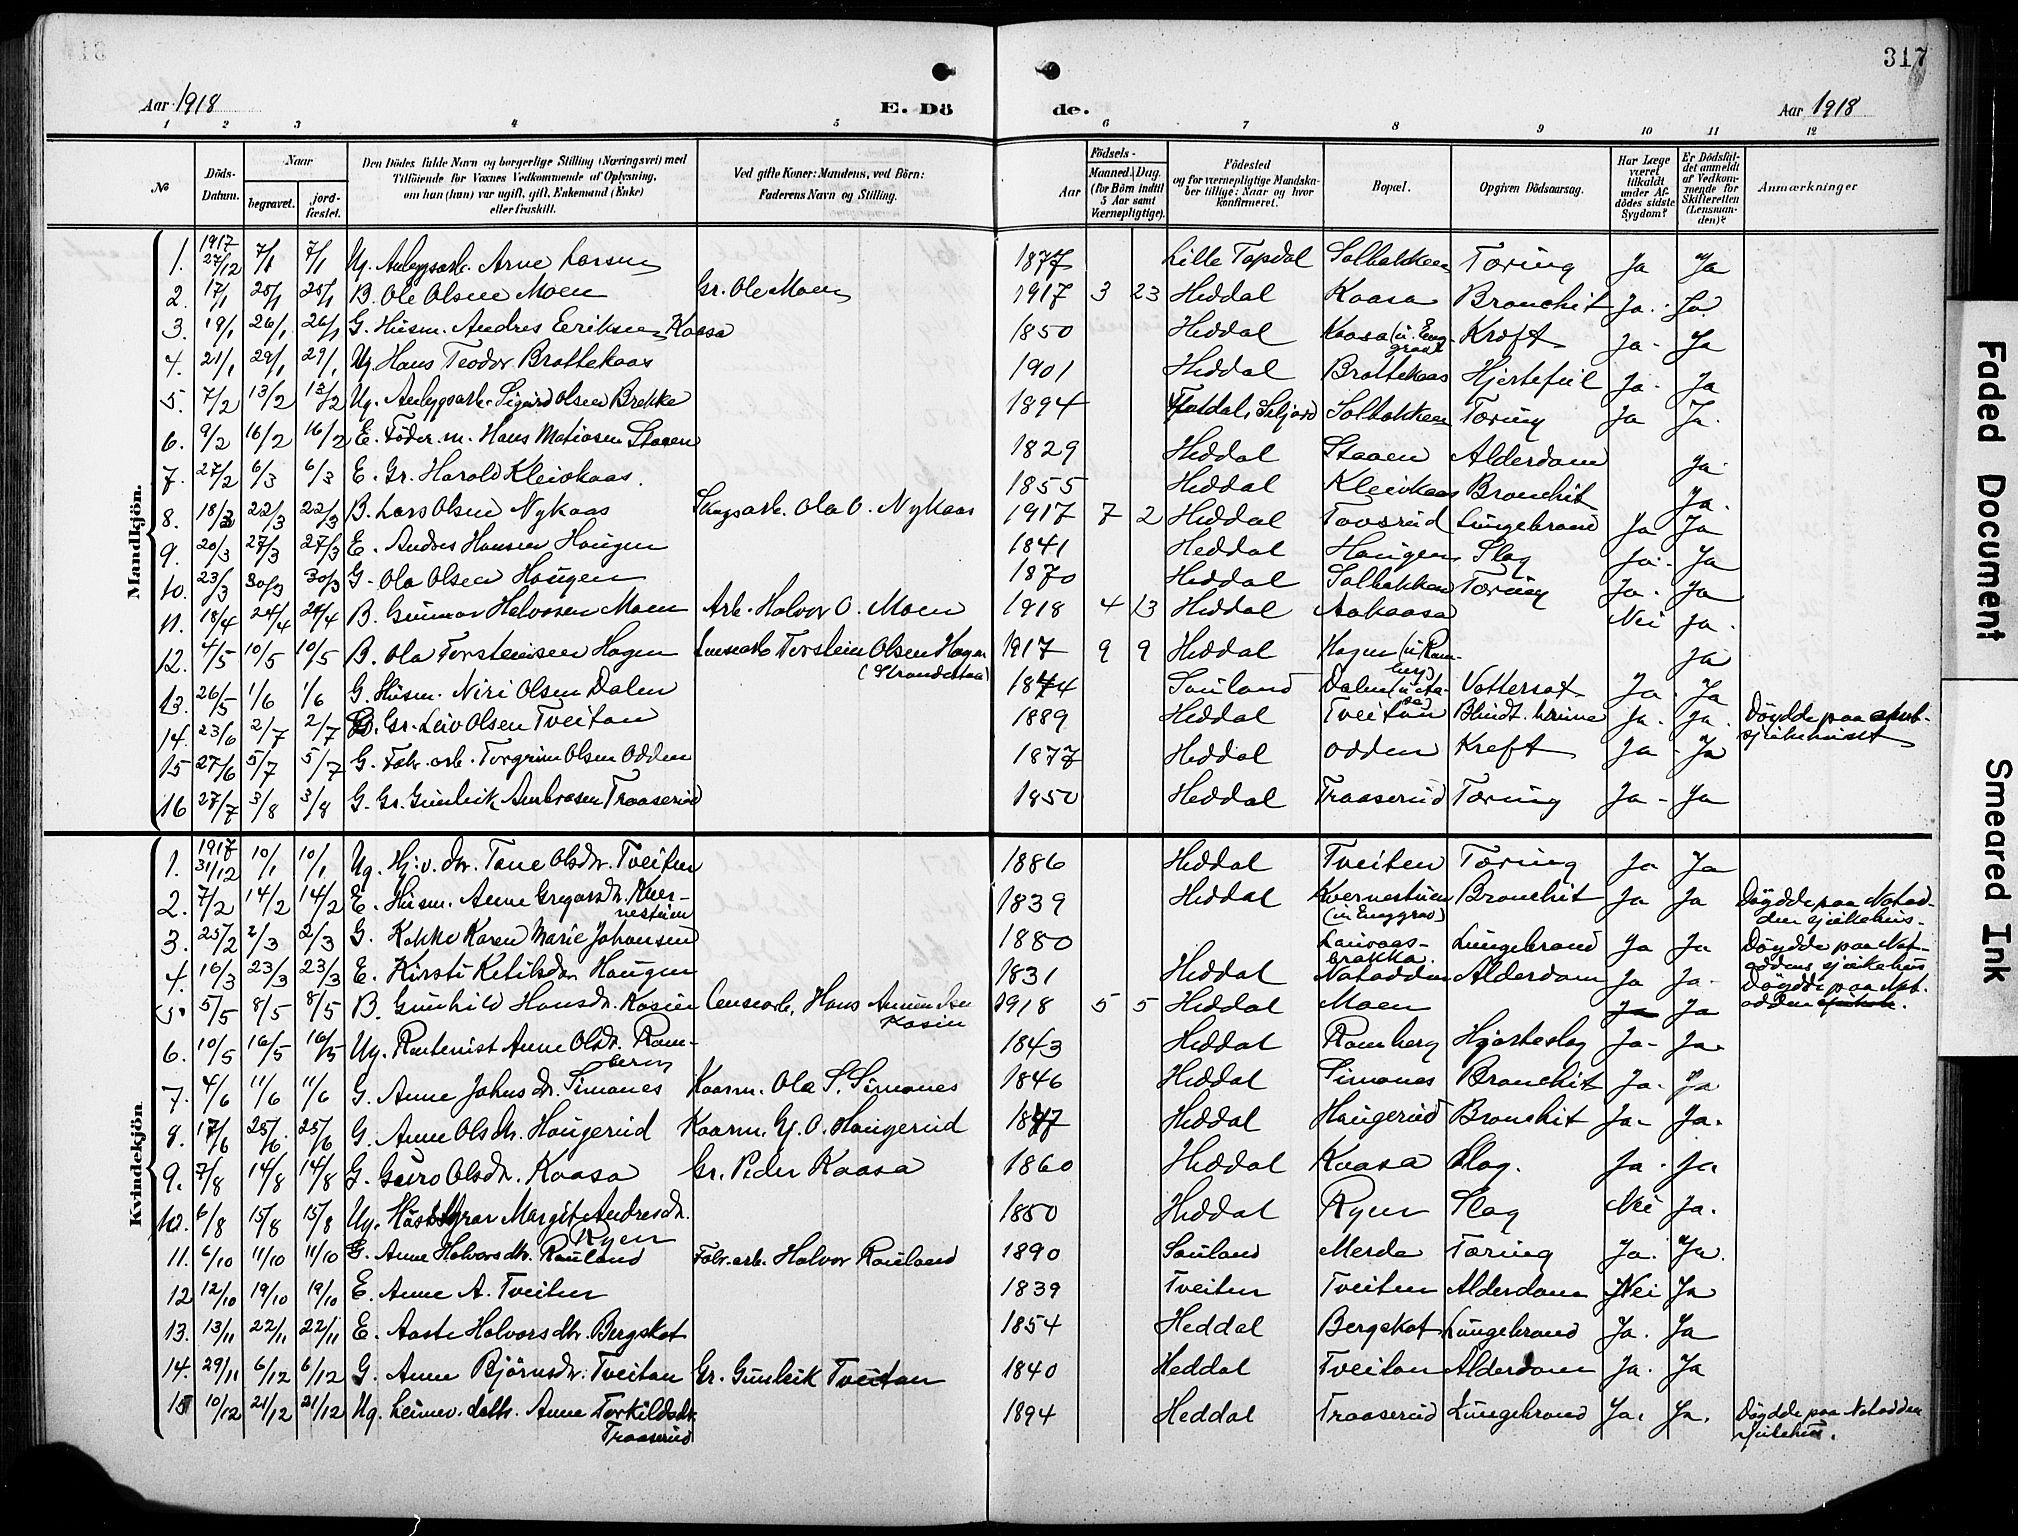 SAKO, Heddal kirkebøker, G/Ga/L0003: Klokkerbok nr. I 3, 1908-1932, s. 317